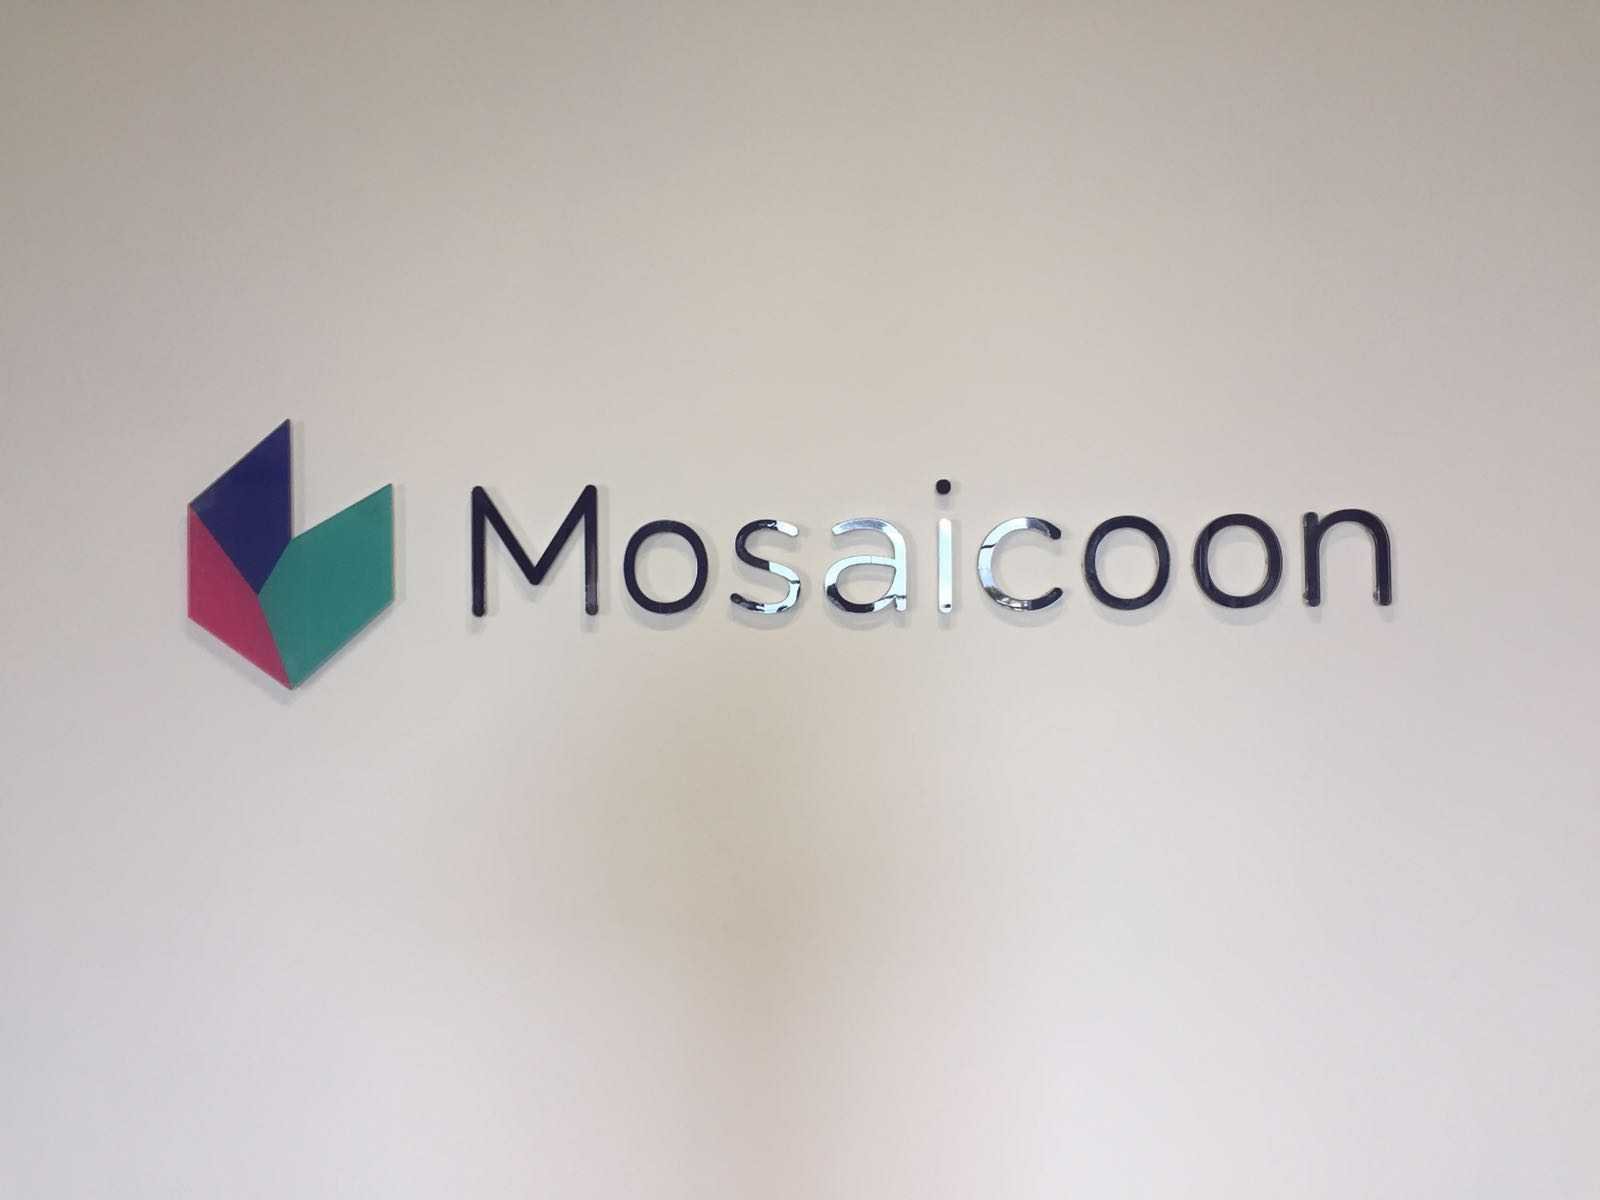 Logo-Mosaicoon